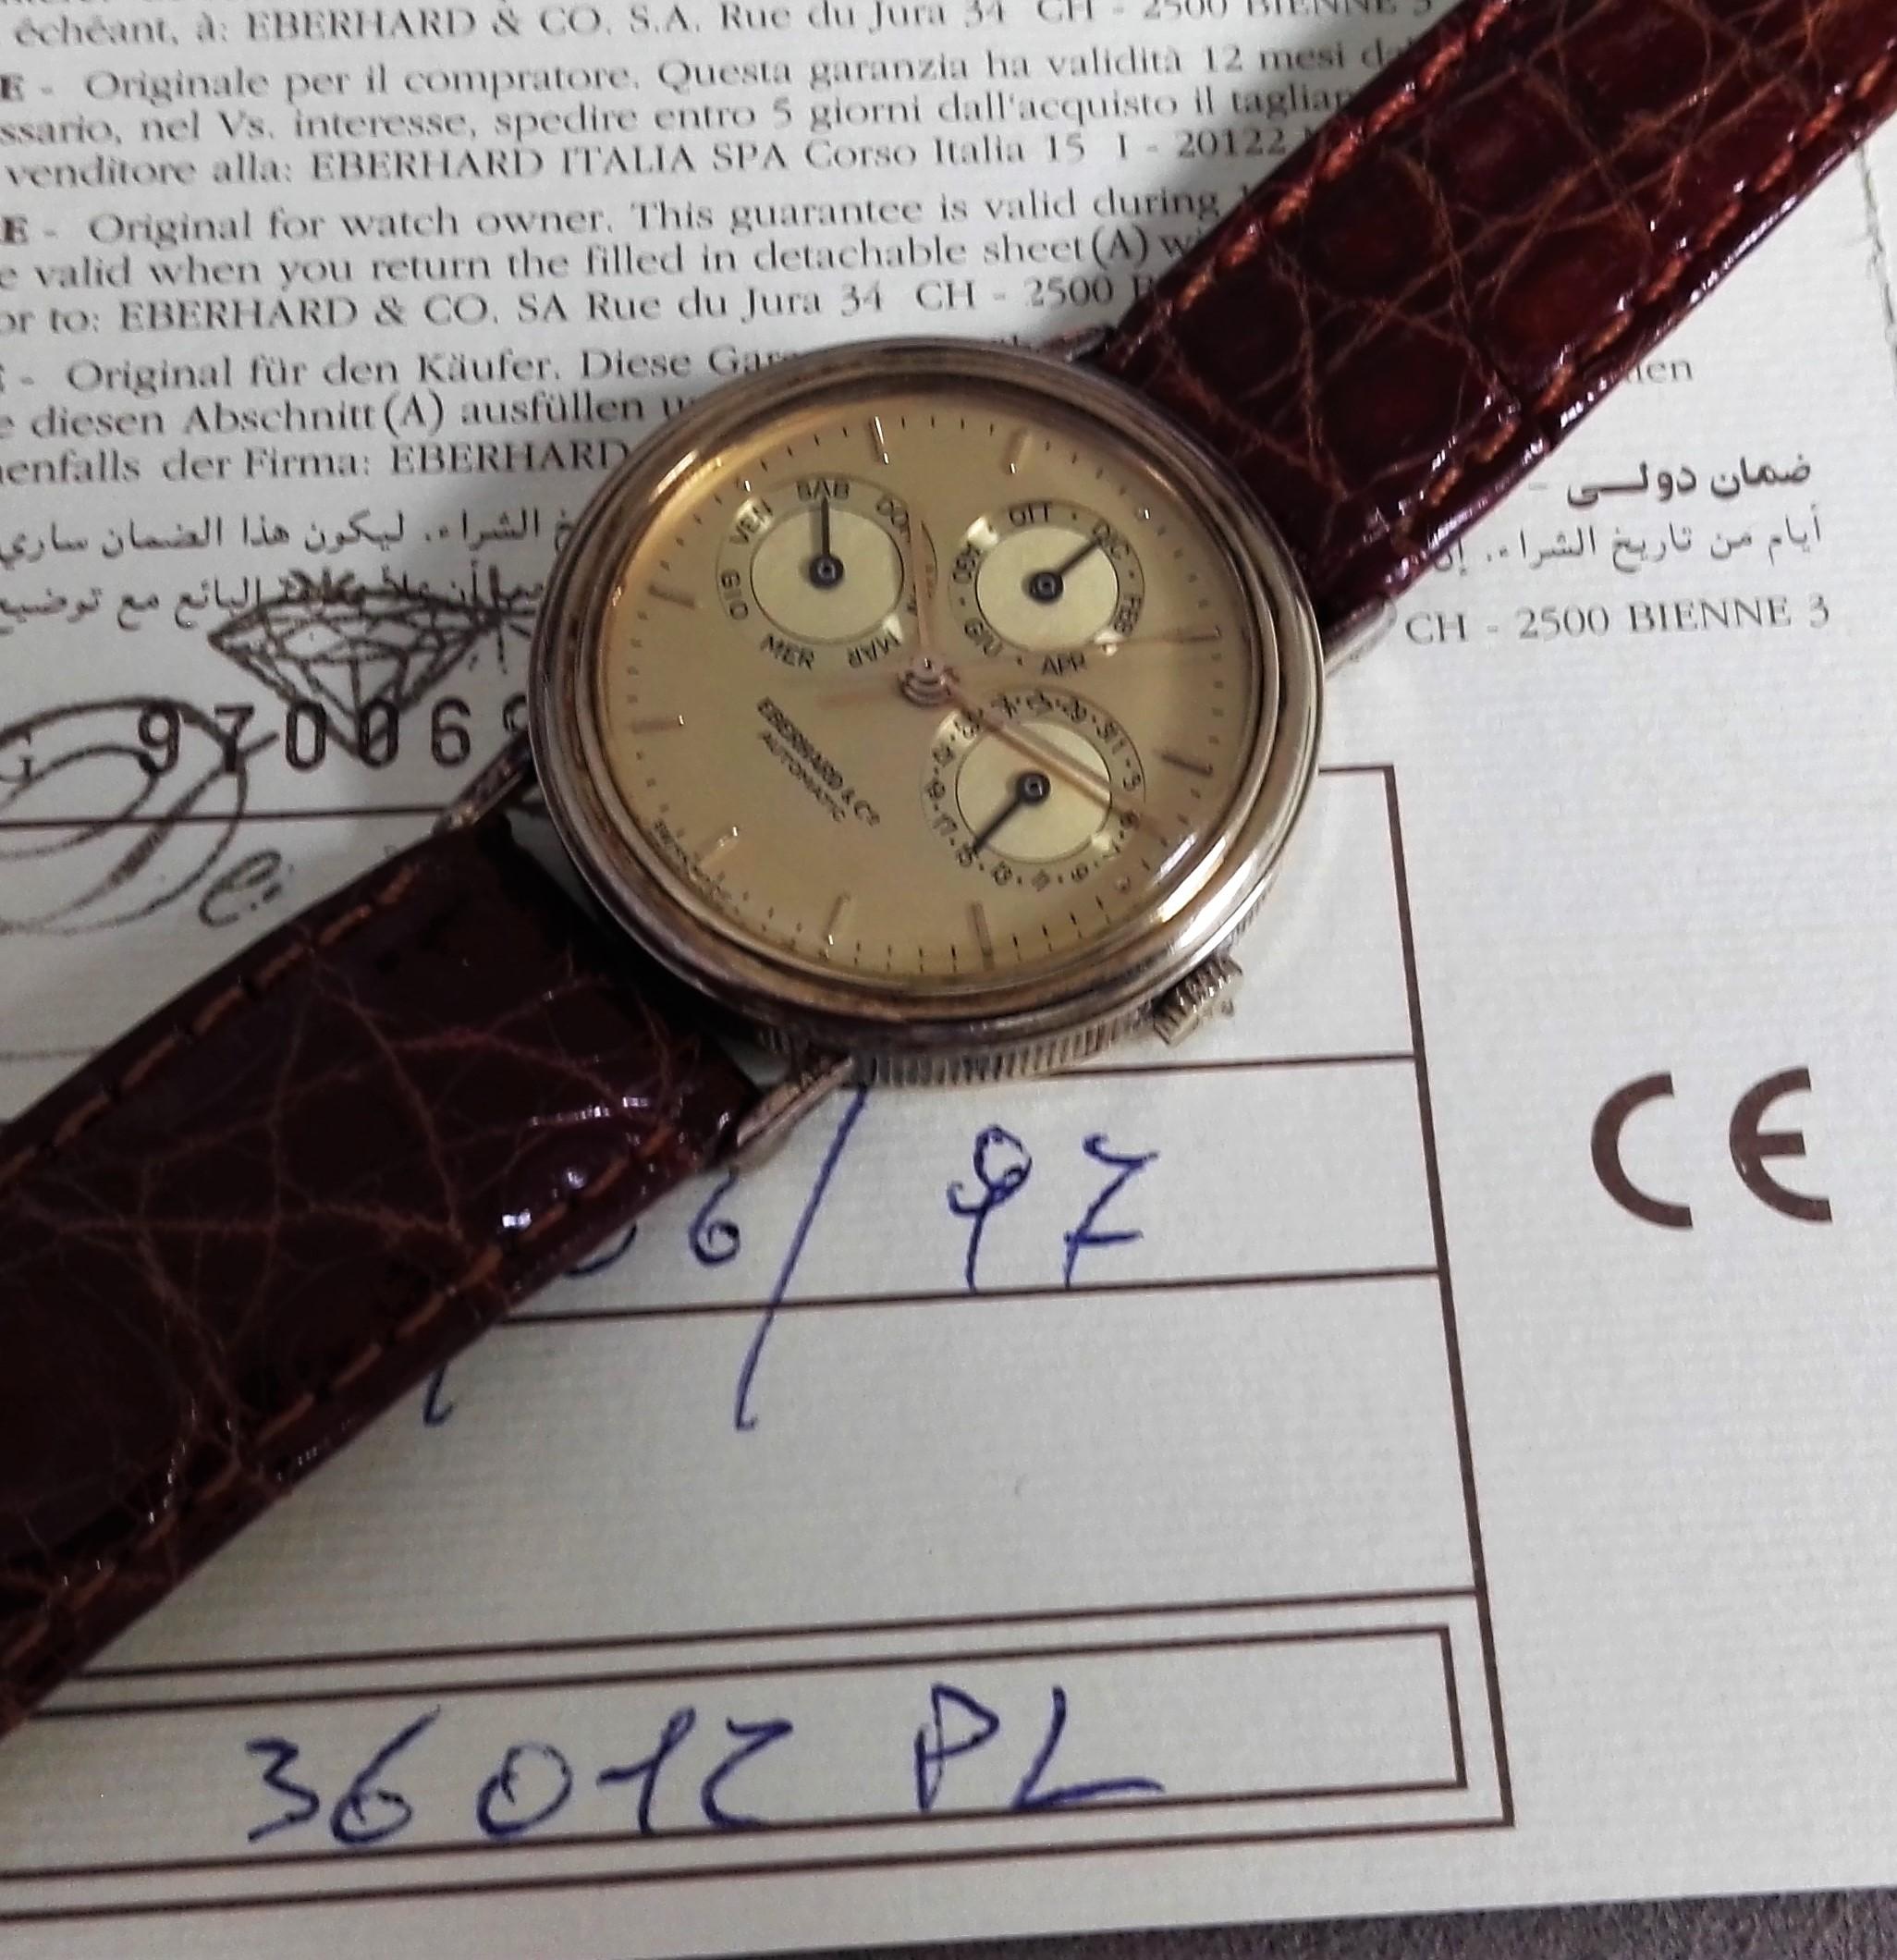 Eberhard & Co. Les Quantiemes Men's Triple Calendar Watch Argent 925 | San Giorgio a Cremano